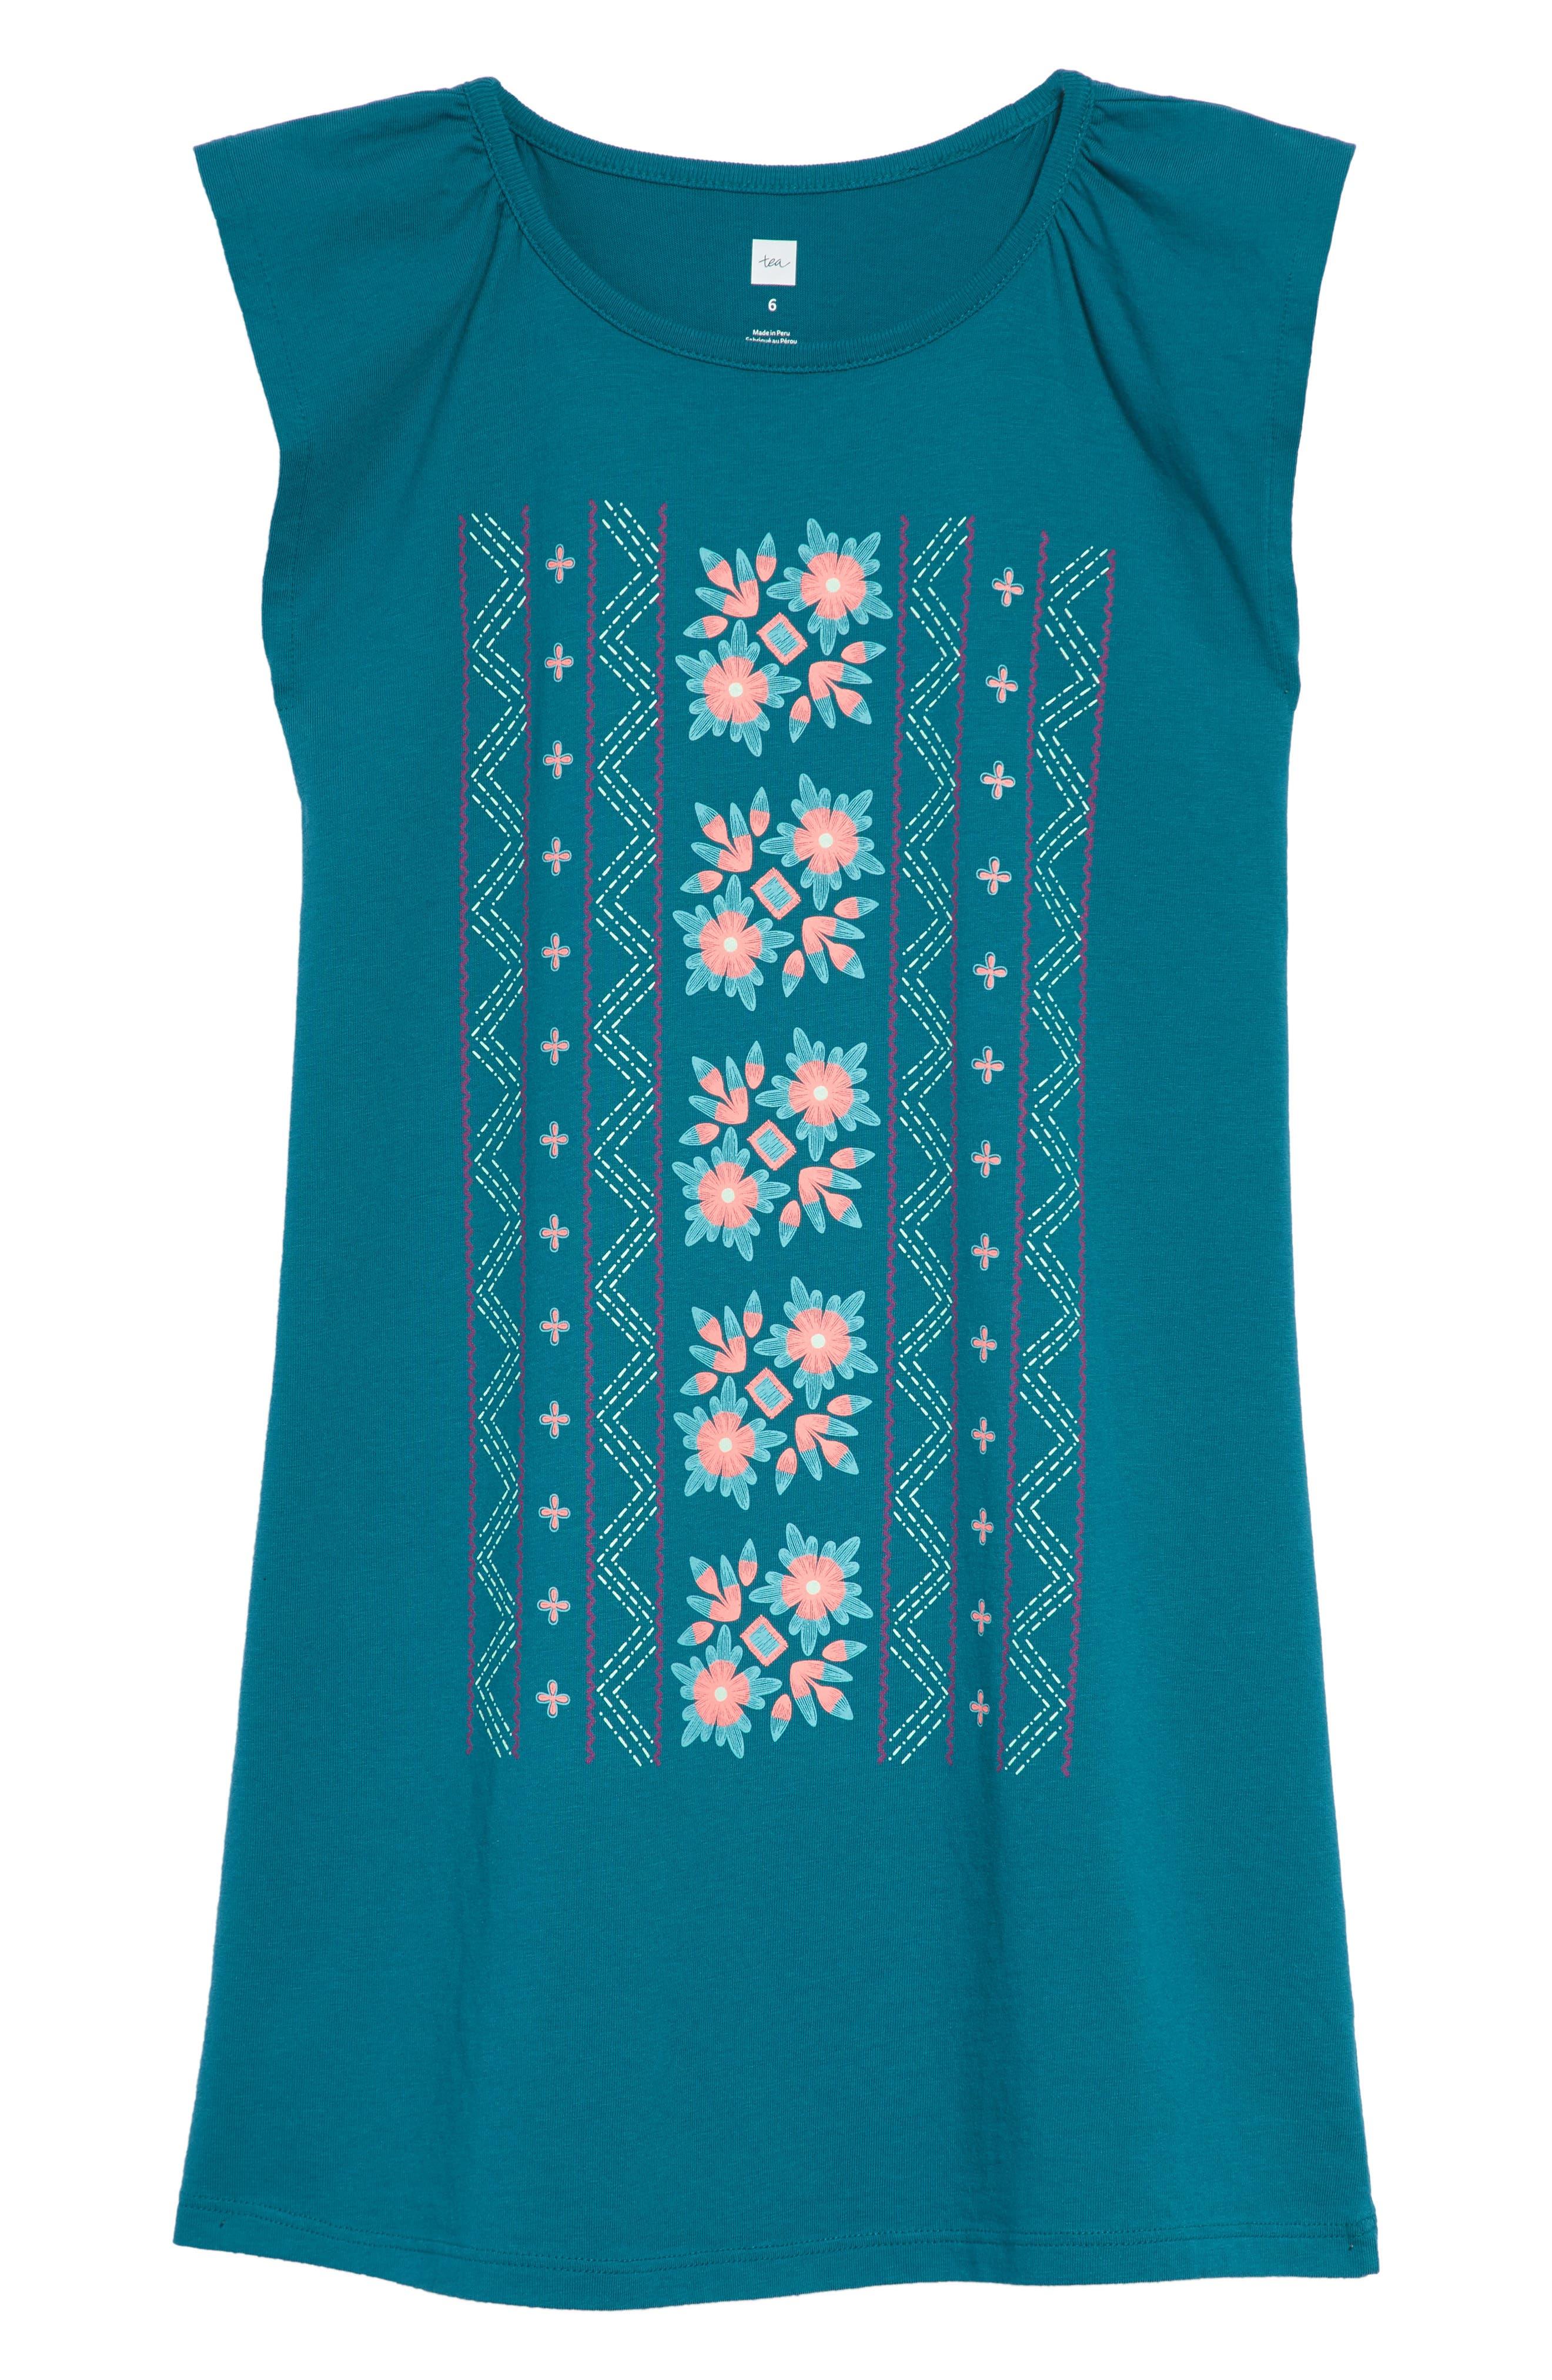 TEA COLLECTION Floral Graphic Dress, Main, color, 446